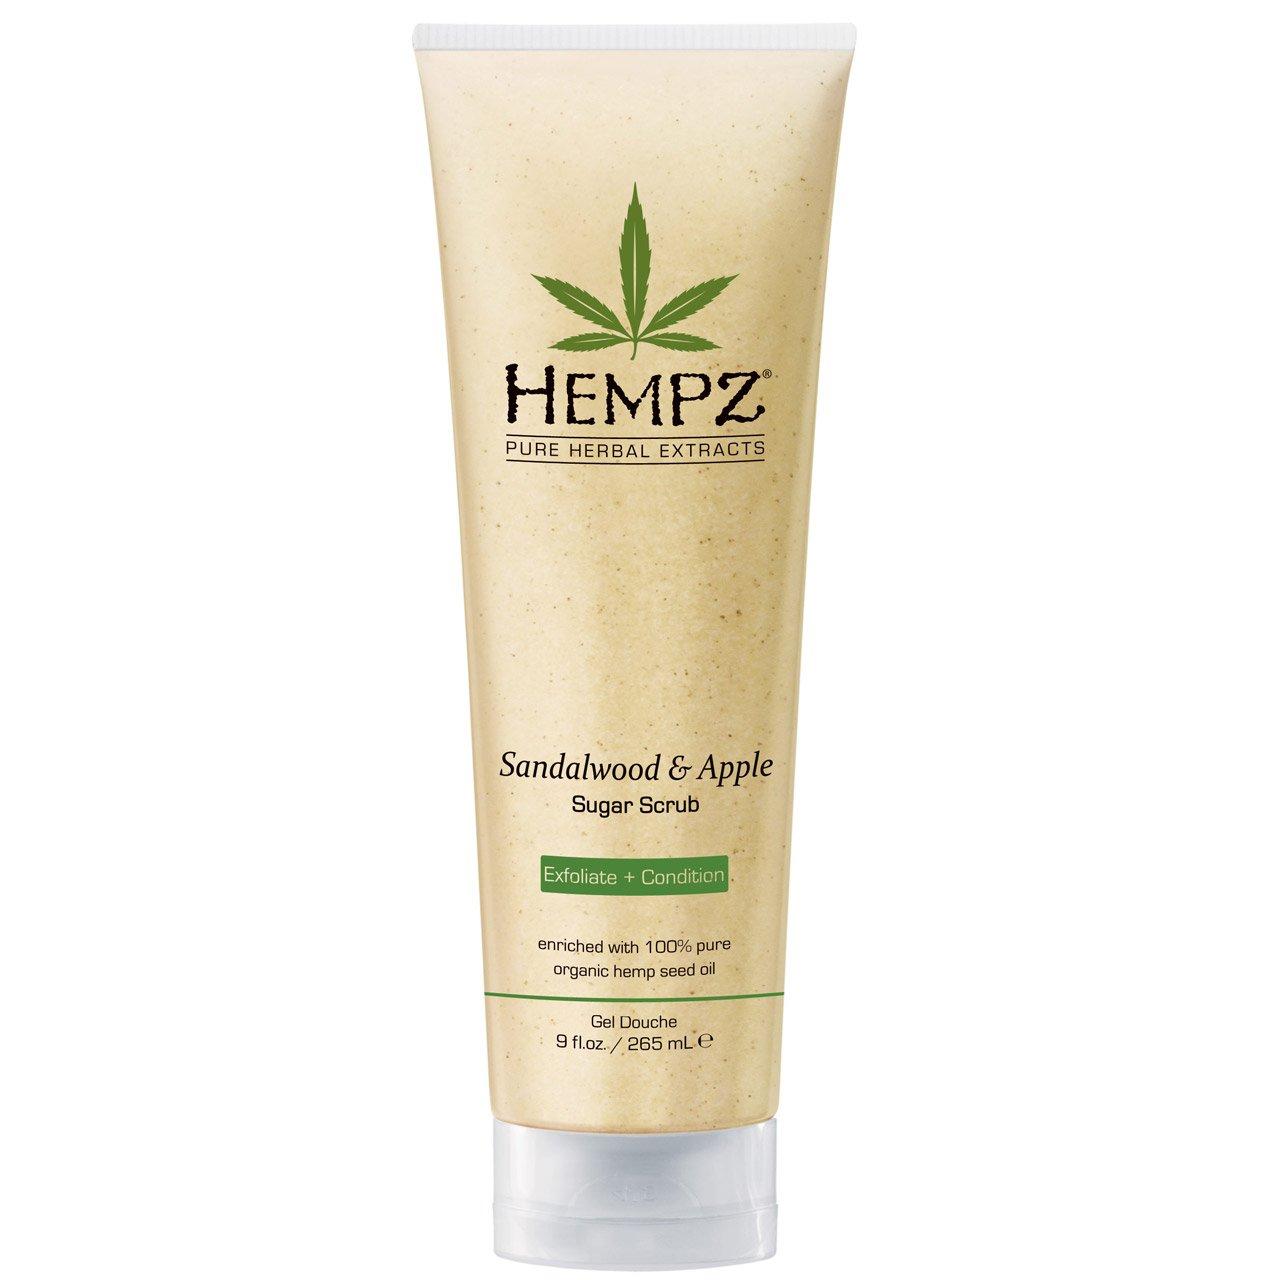 Hempz Finally resale start Herbal Body Scrub Sandalwood Apple Ounce 9 Import And